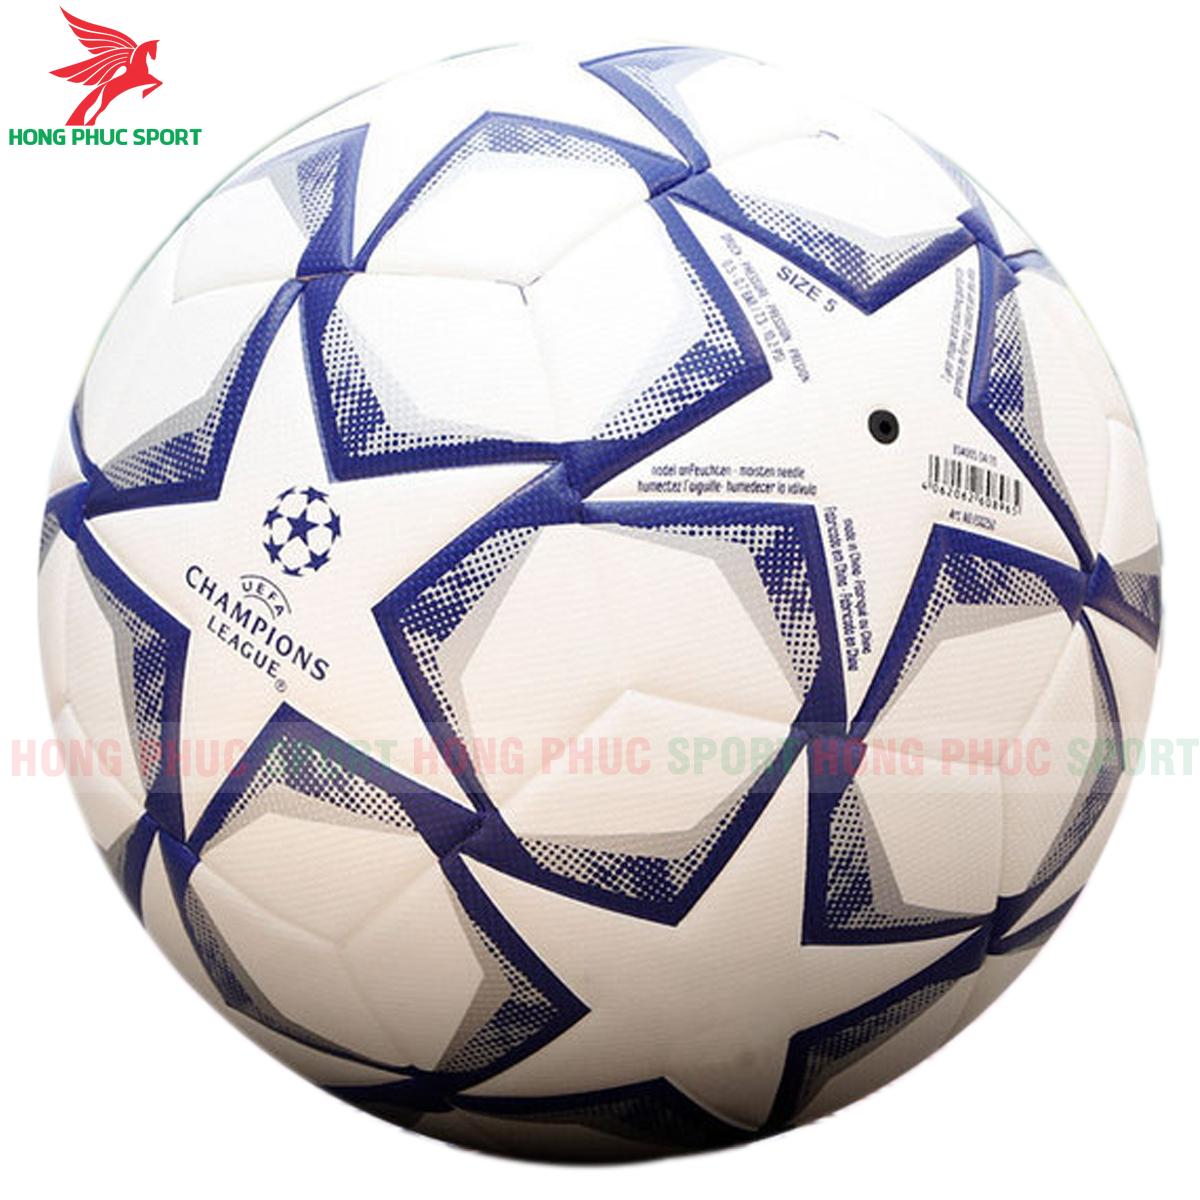 https://cdn.hongphucsport.com/unsafe/s4.shopbay.vn/files/285/qua-bong-da-champions-league-2021-mau-2-6089386cd8cae.png